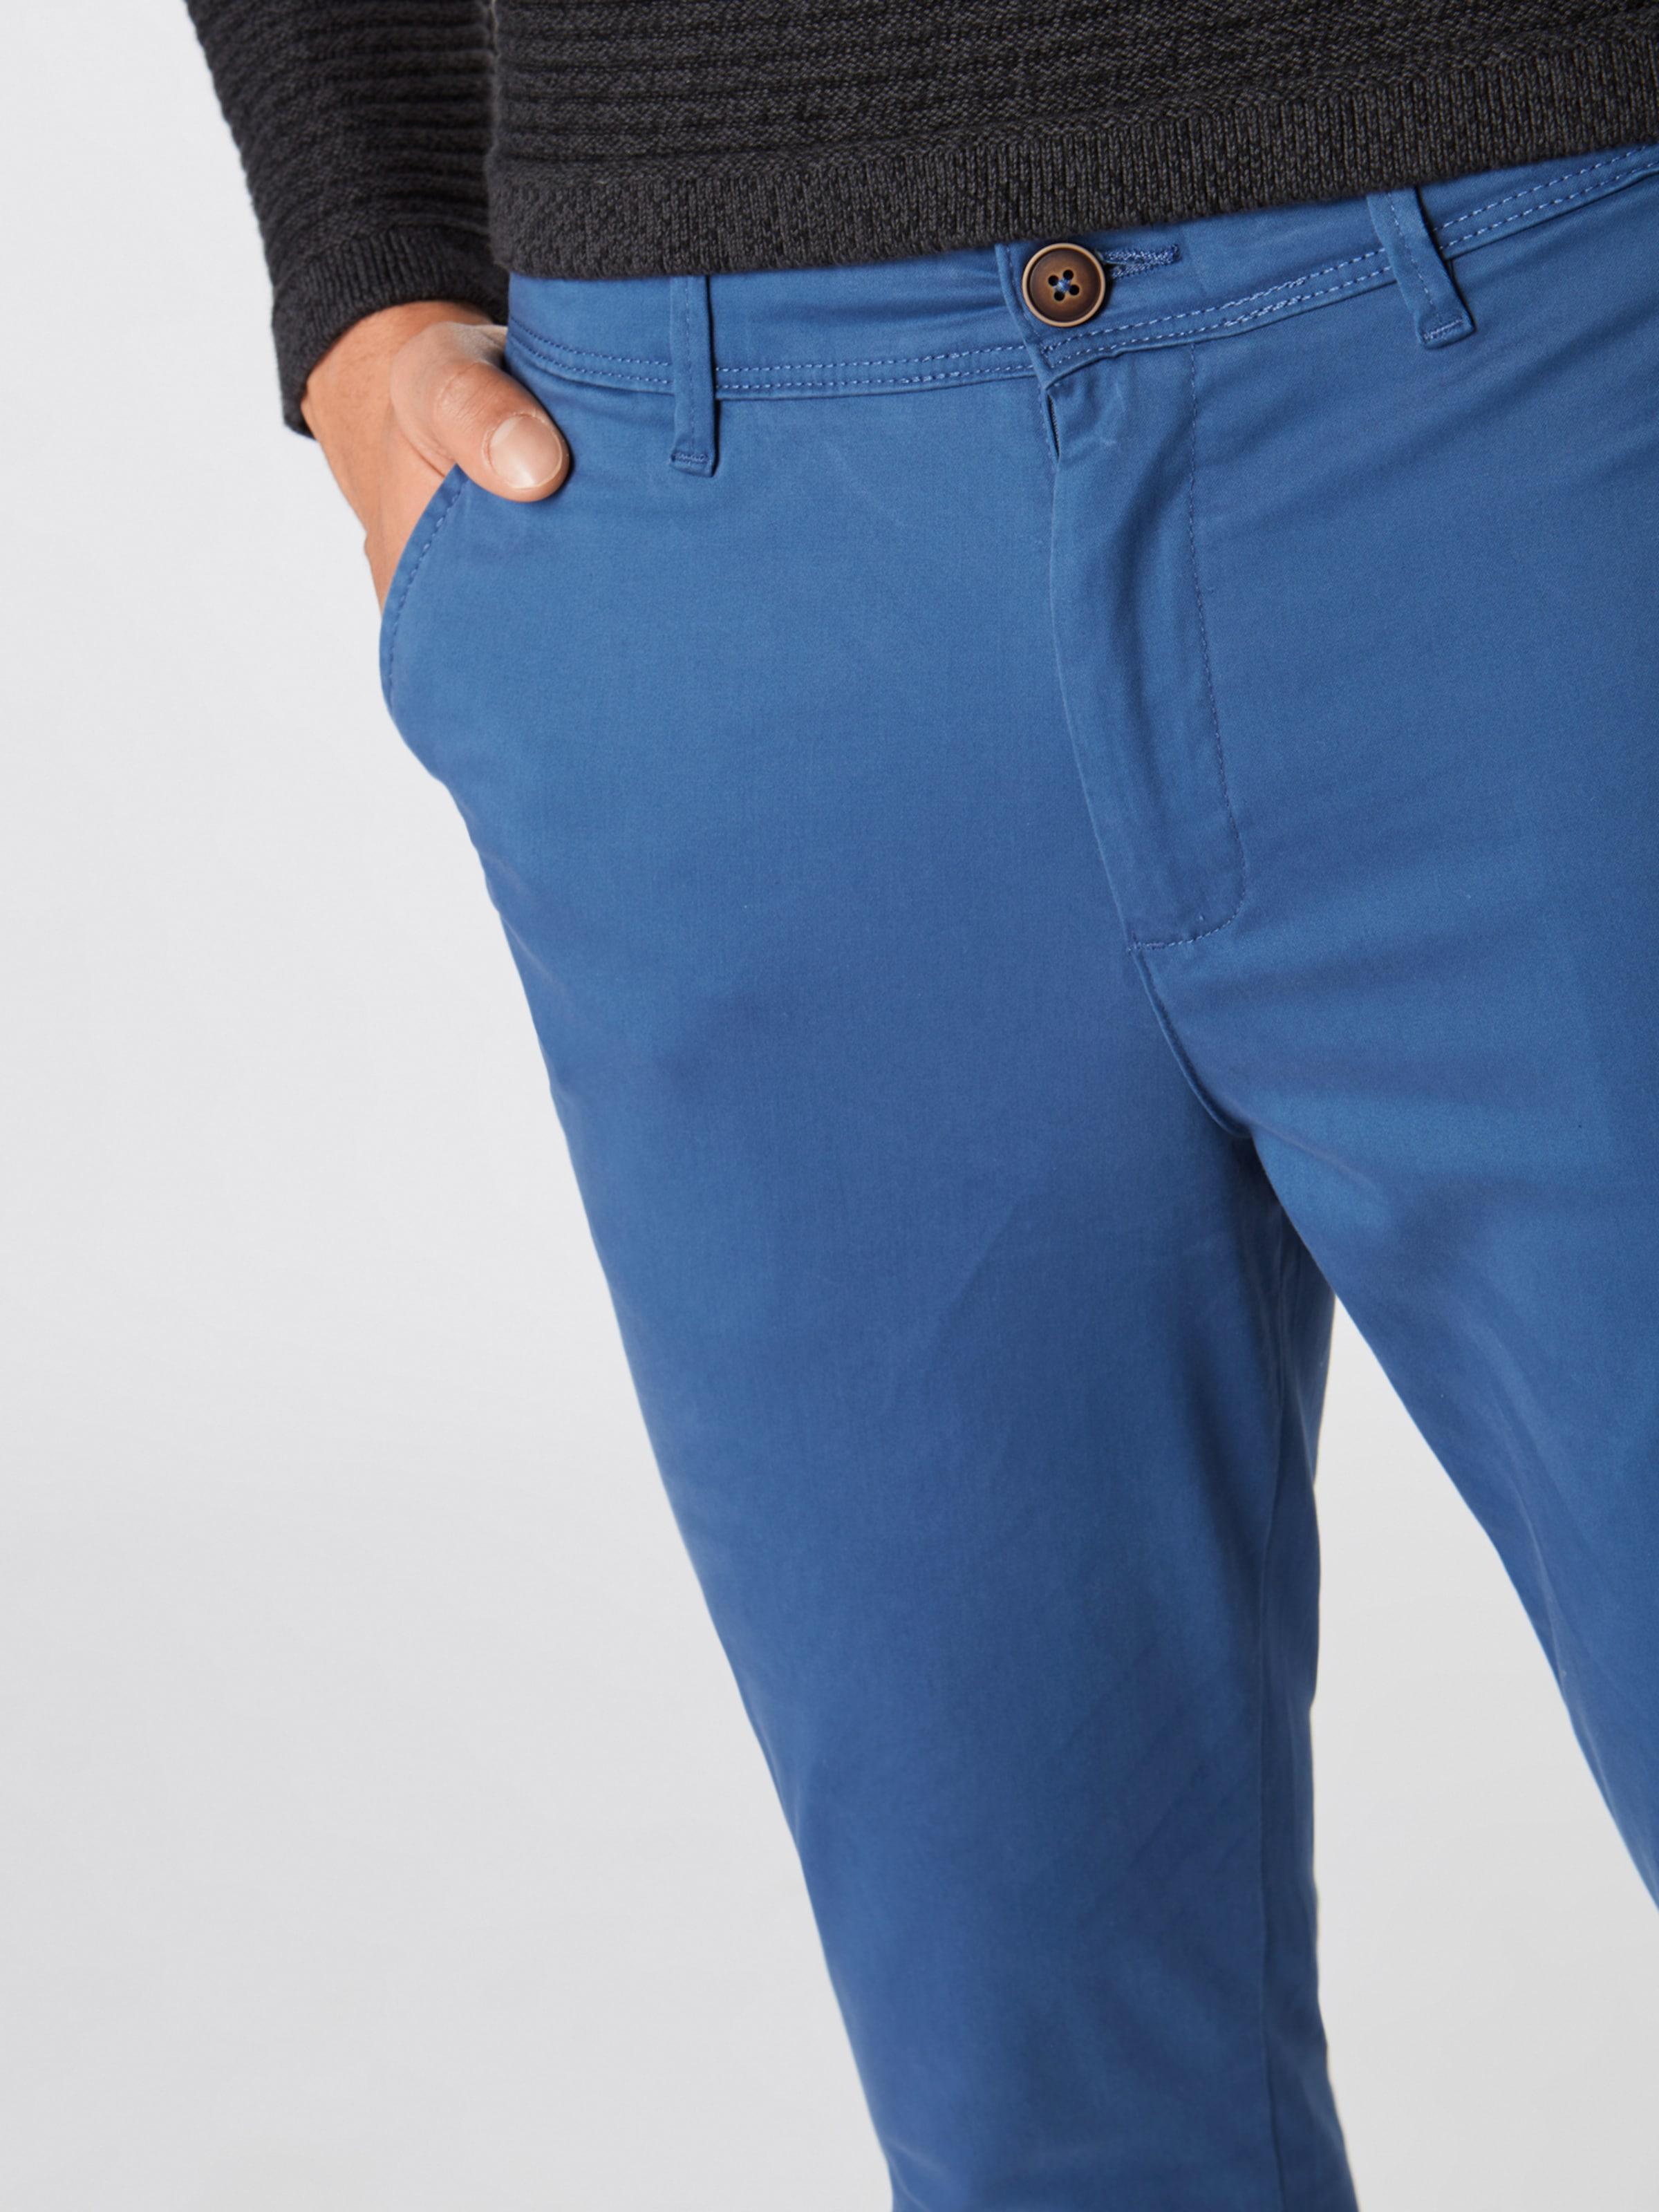 En Chino Pantalon Bowie' Jackamp; Bleu 'marco Jones Marine N0OXkwPnZ8